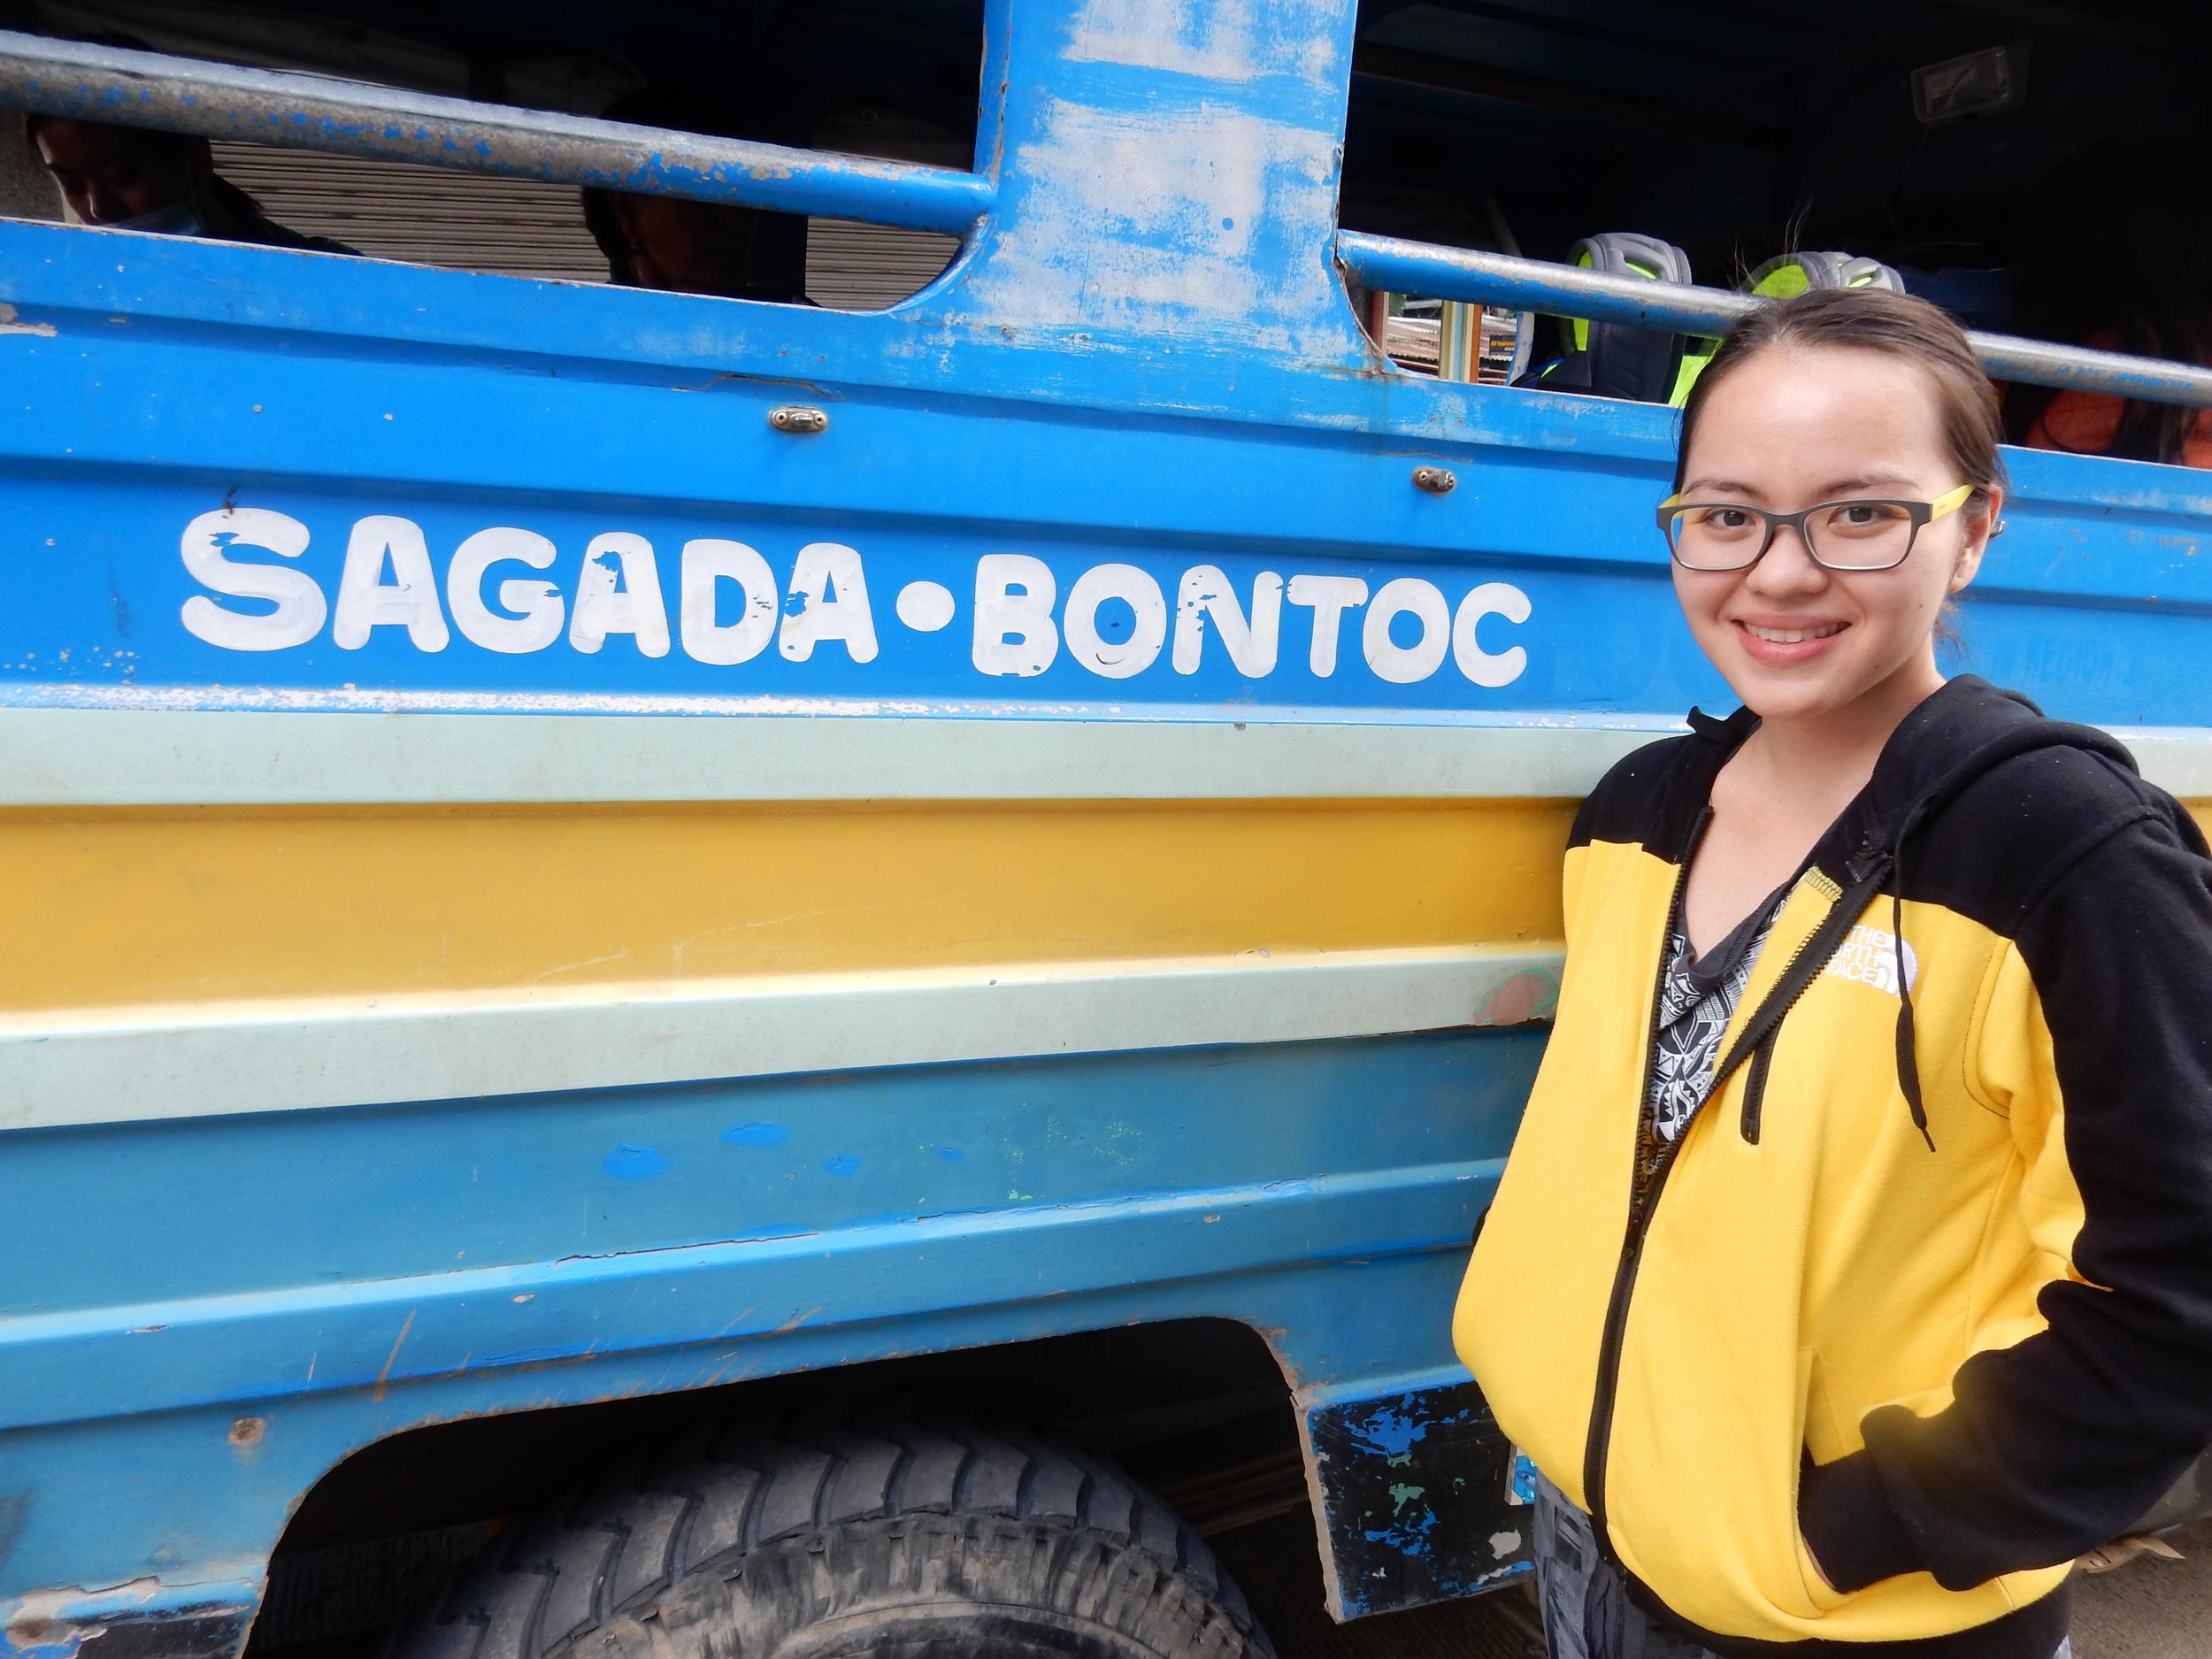 jeep from bontoc to sagada